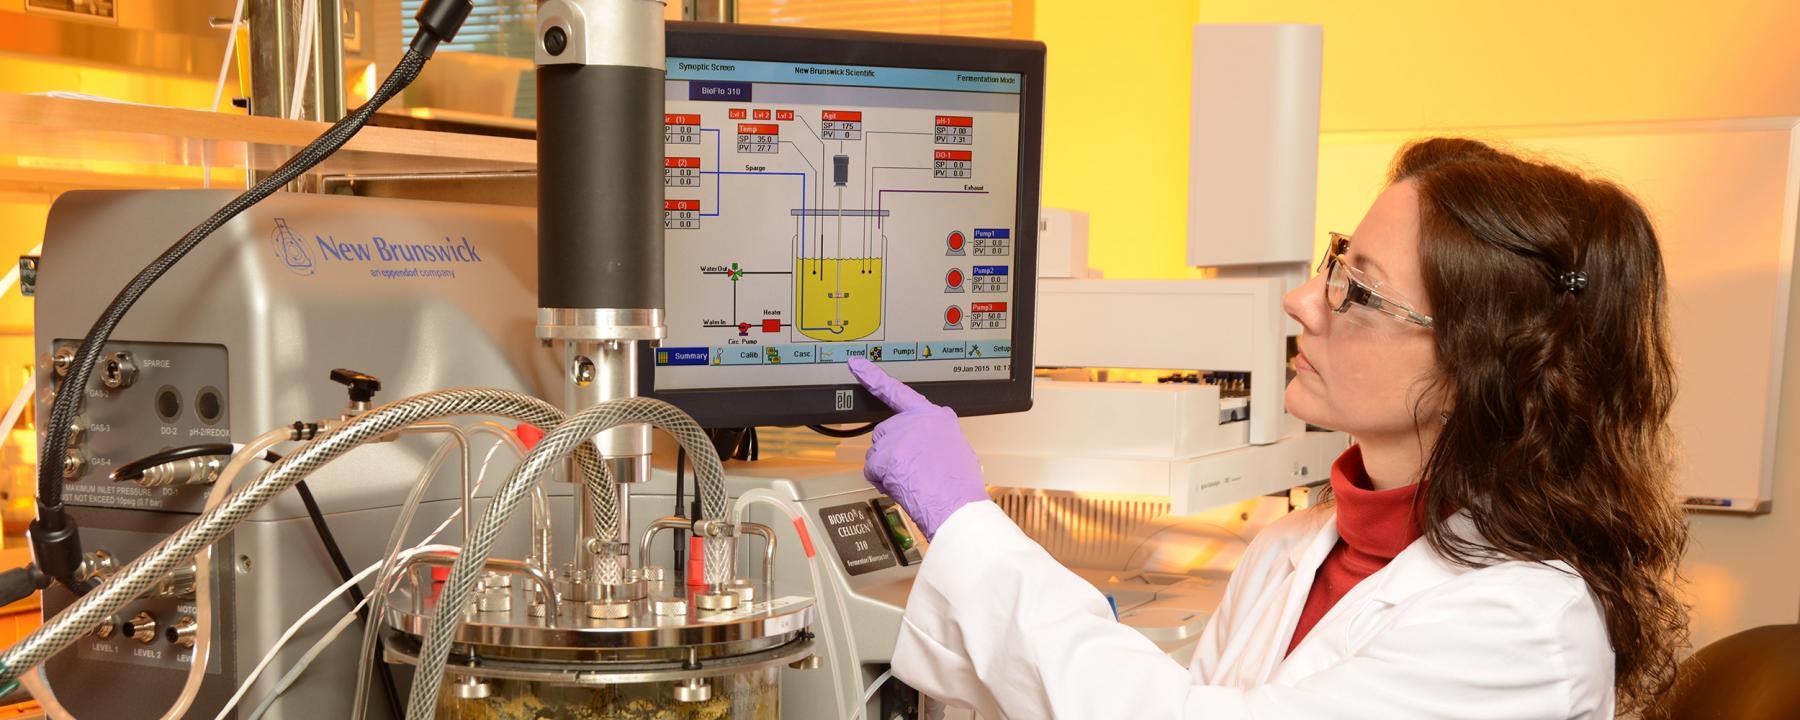 Woman using anaerobic bioreactor equipment